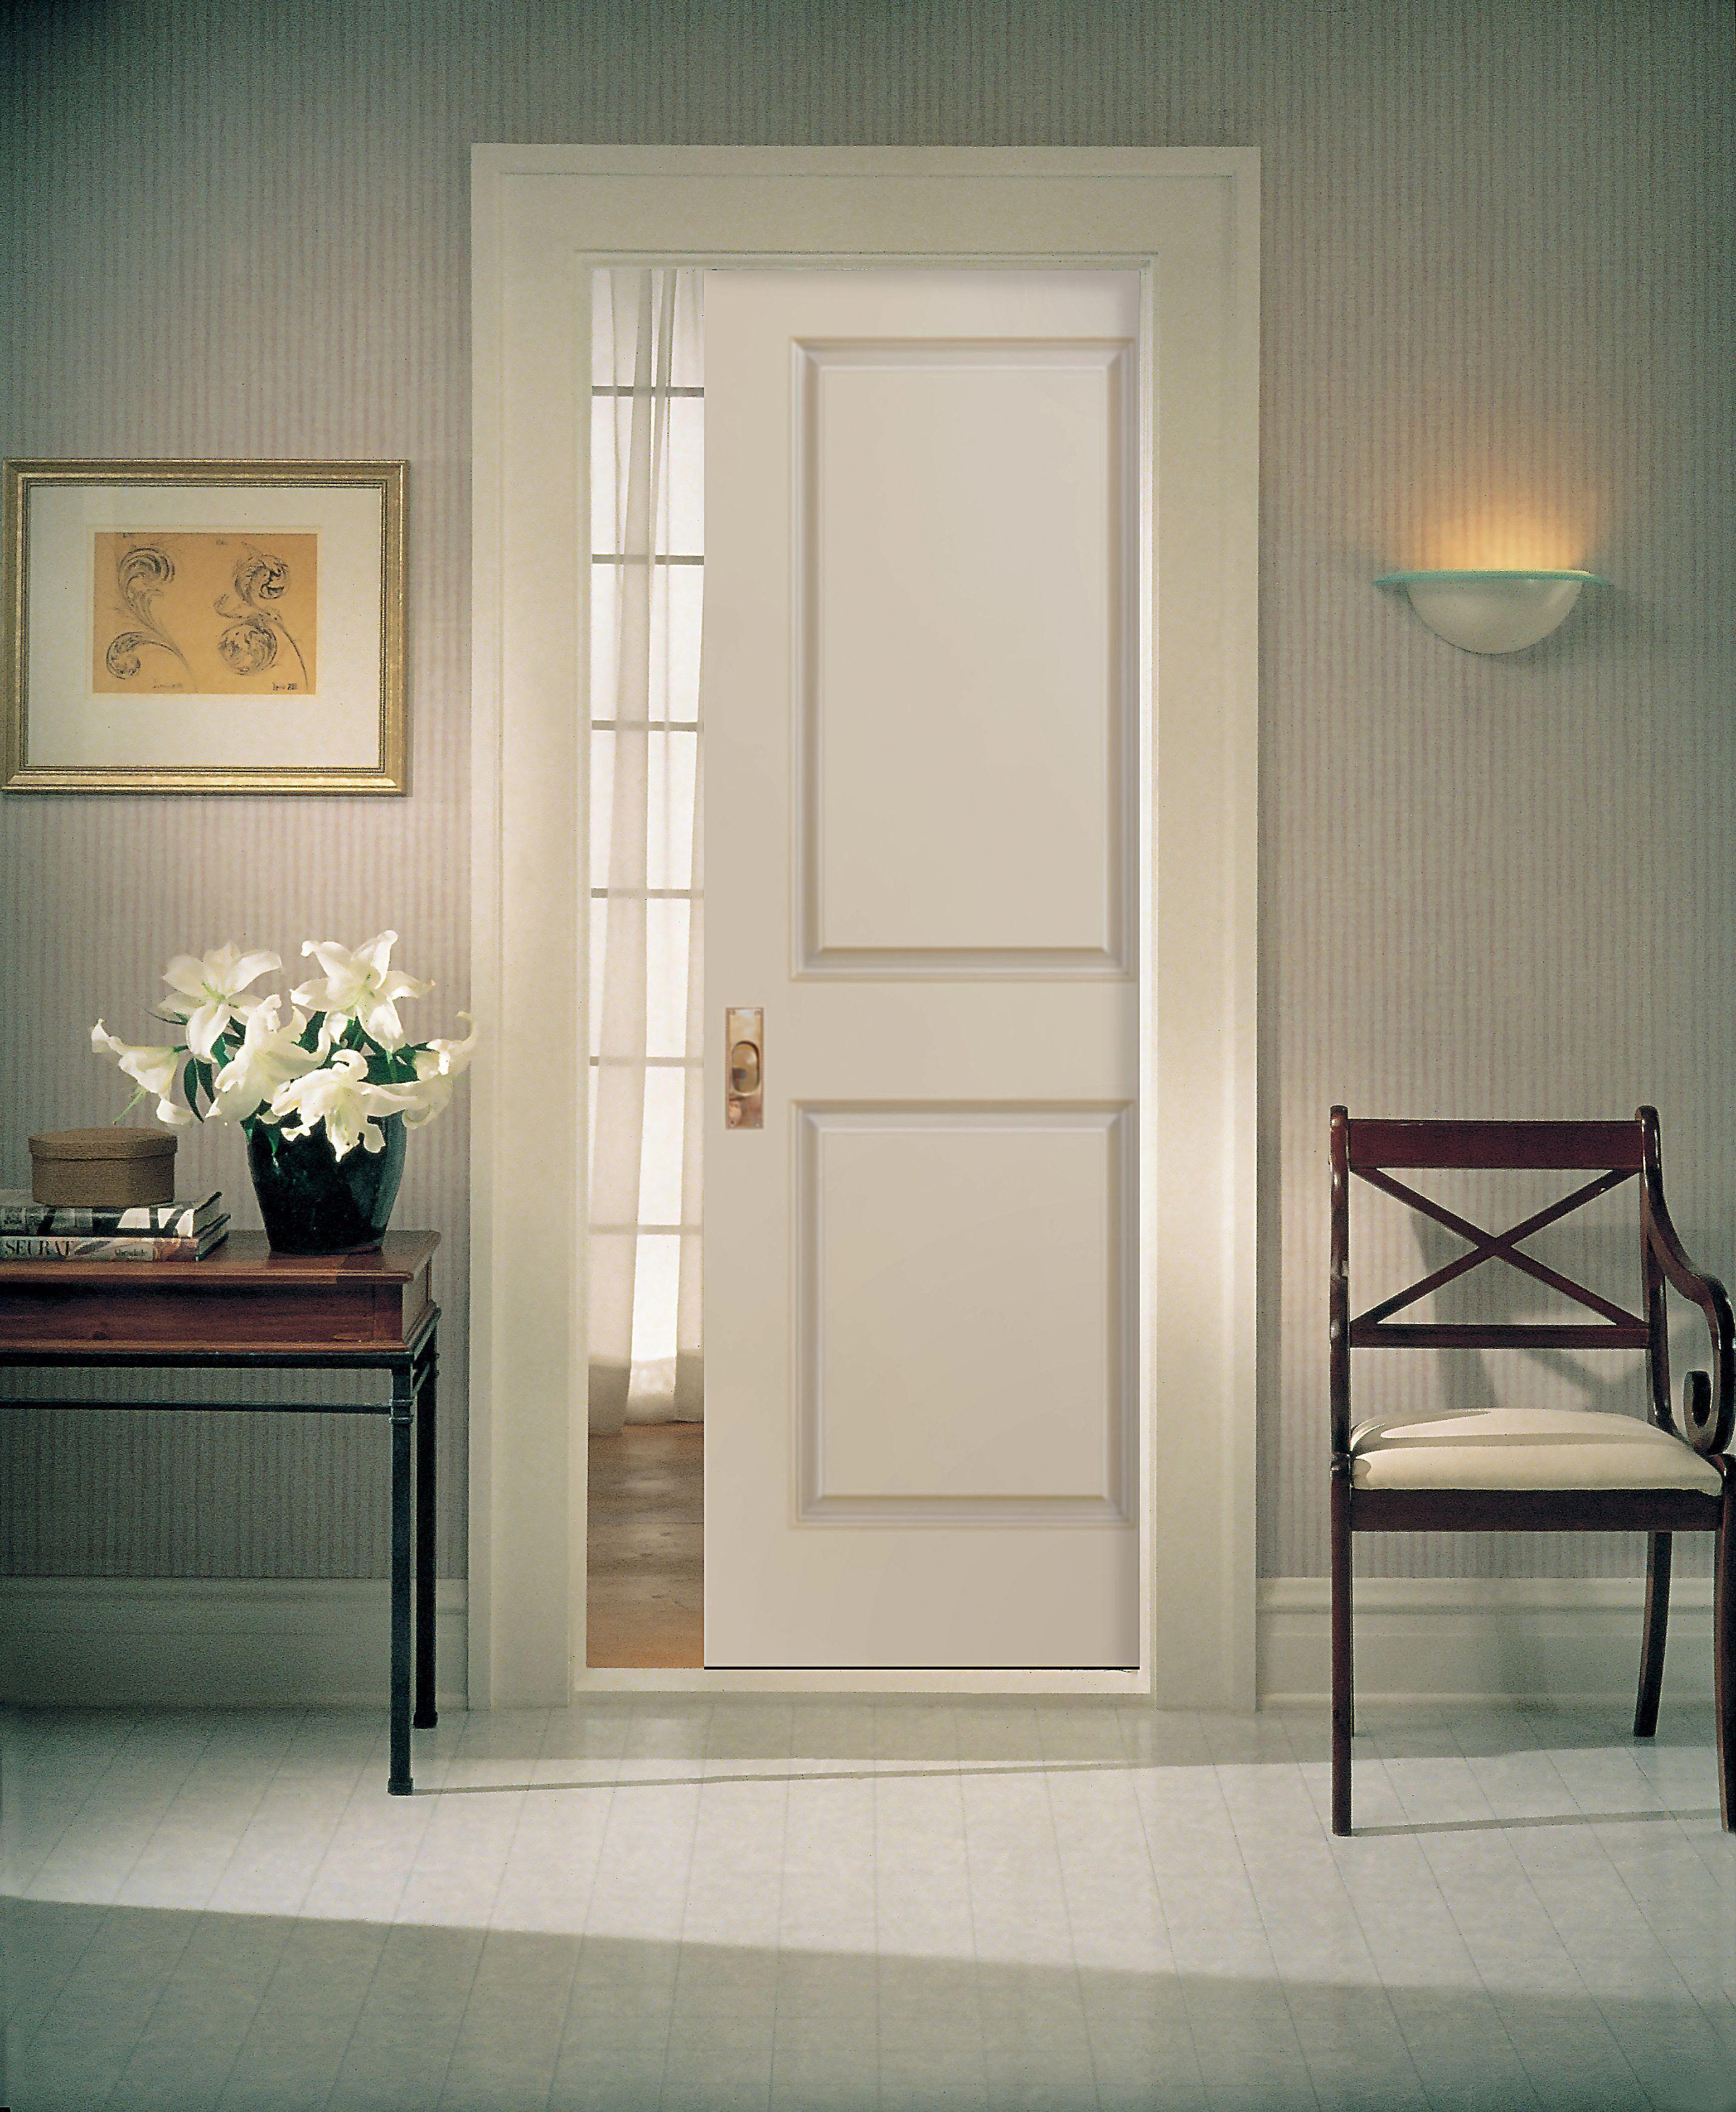 Sliding Door Sizes